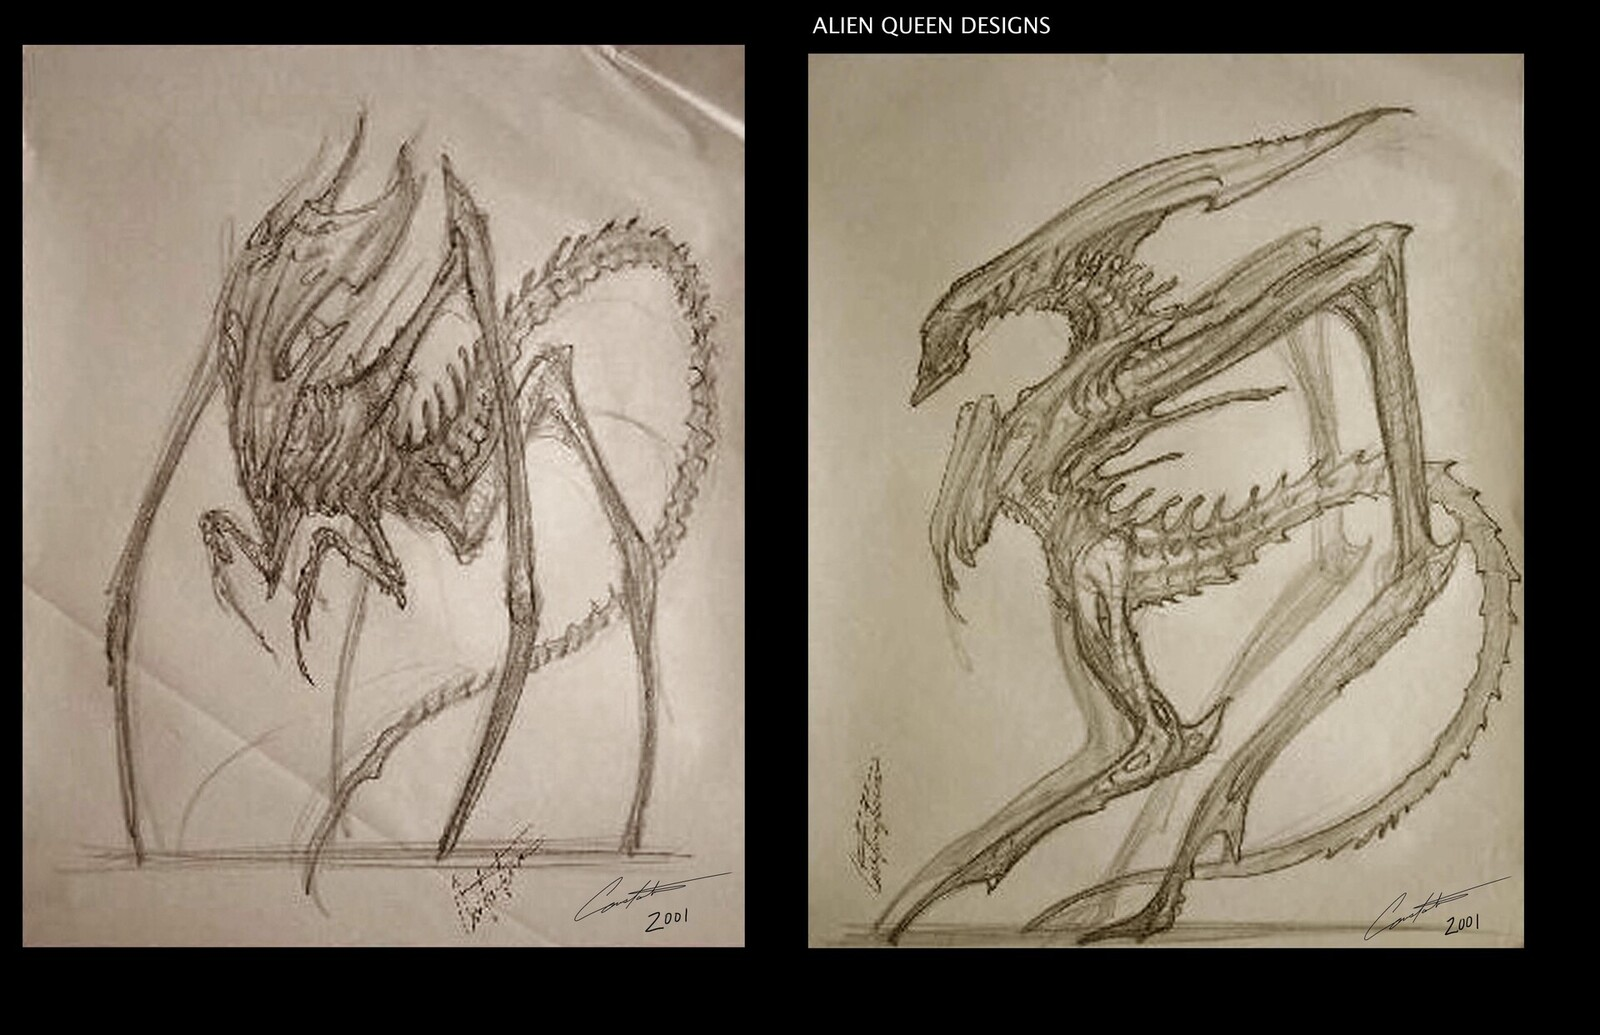 AvP Alien Queen designs sketch i did back in 2001 at EdgeFX